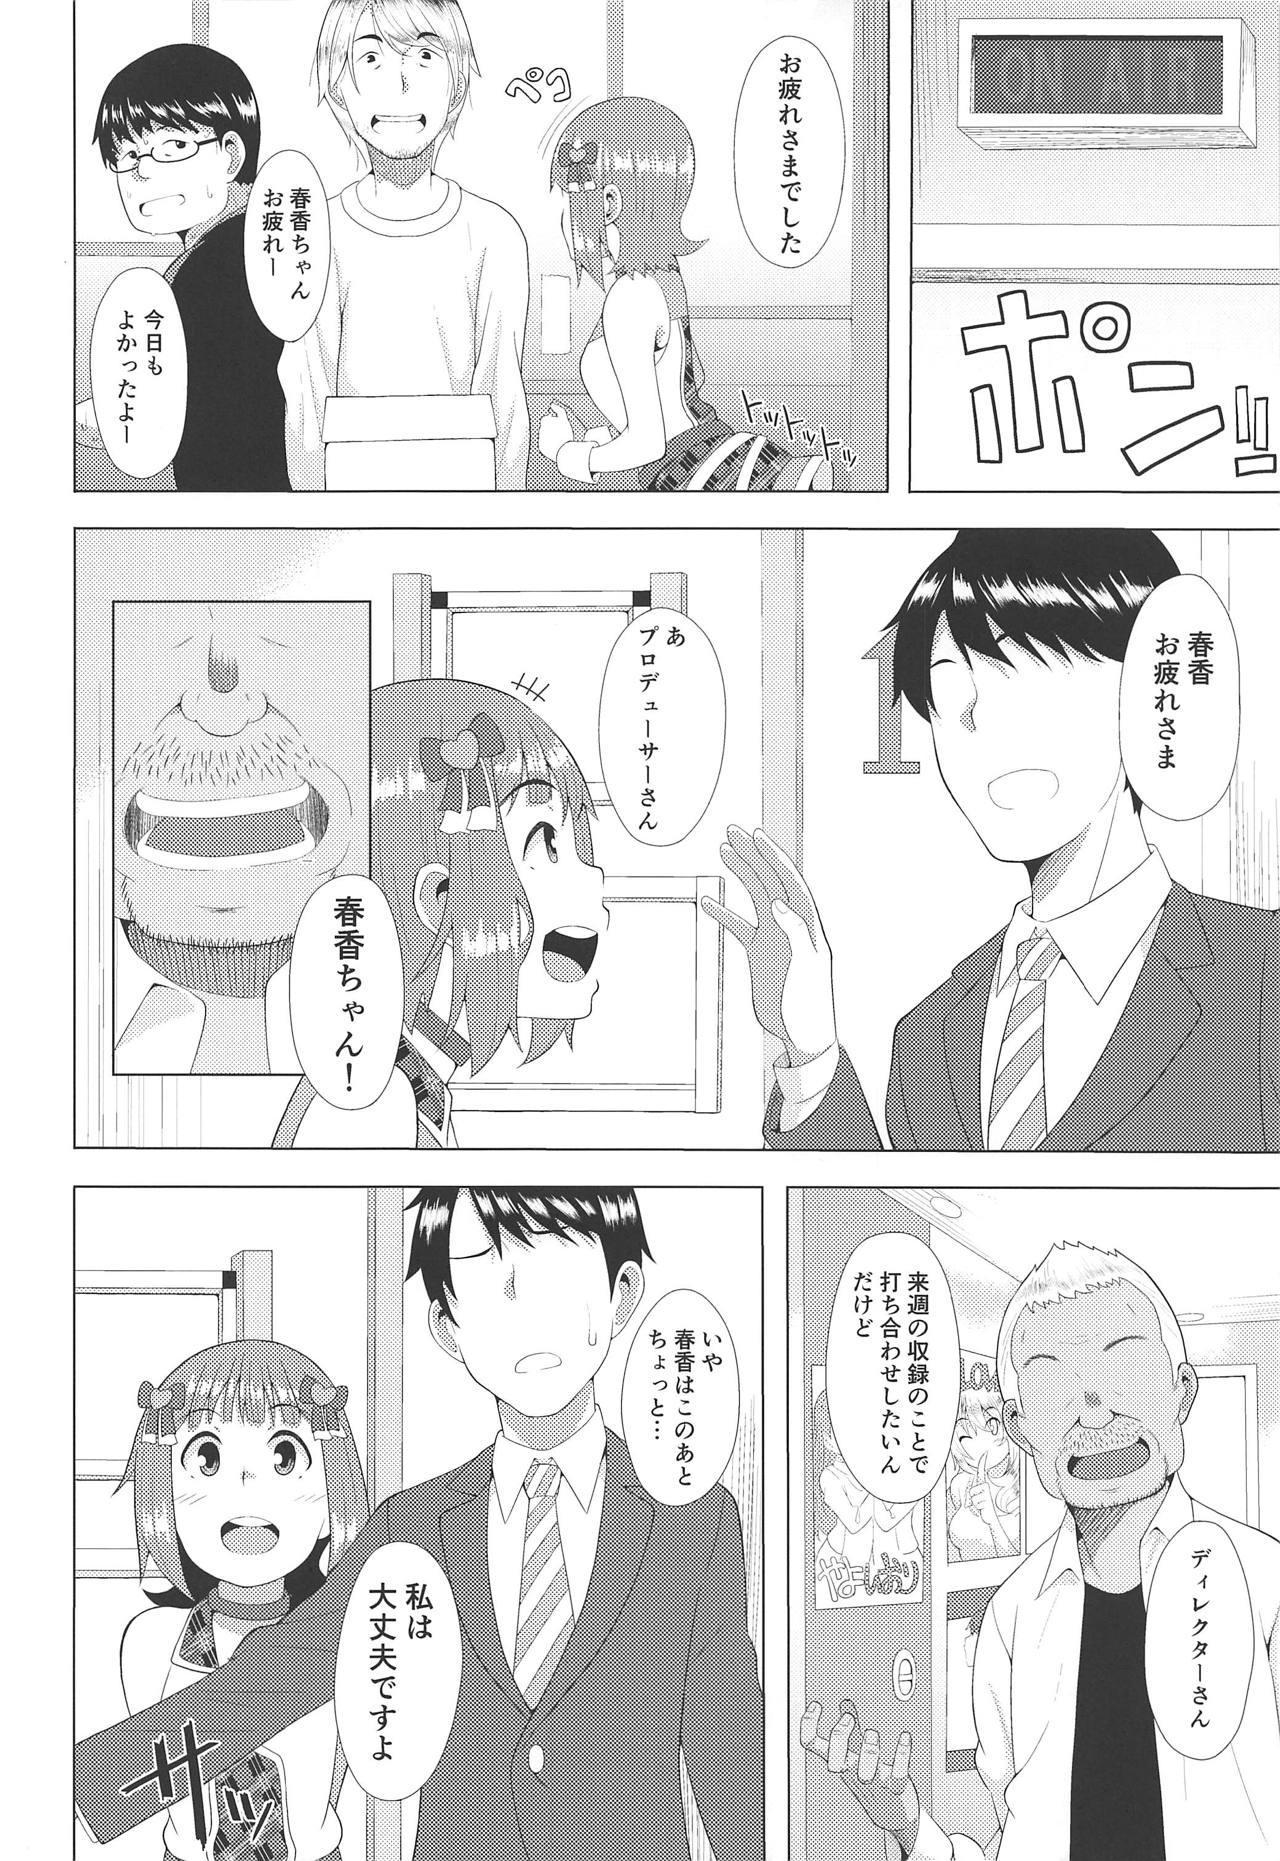 Ninki Idol no Renai Jijou 2